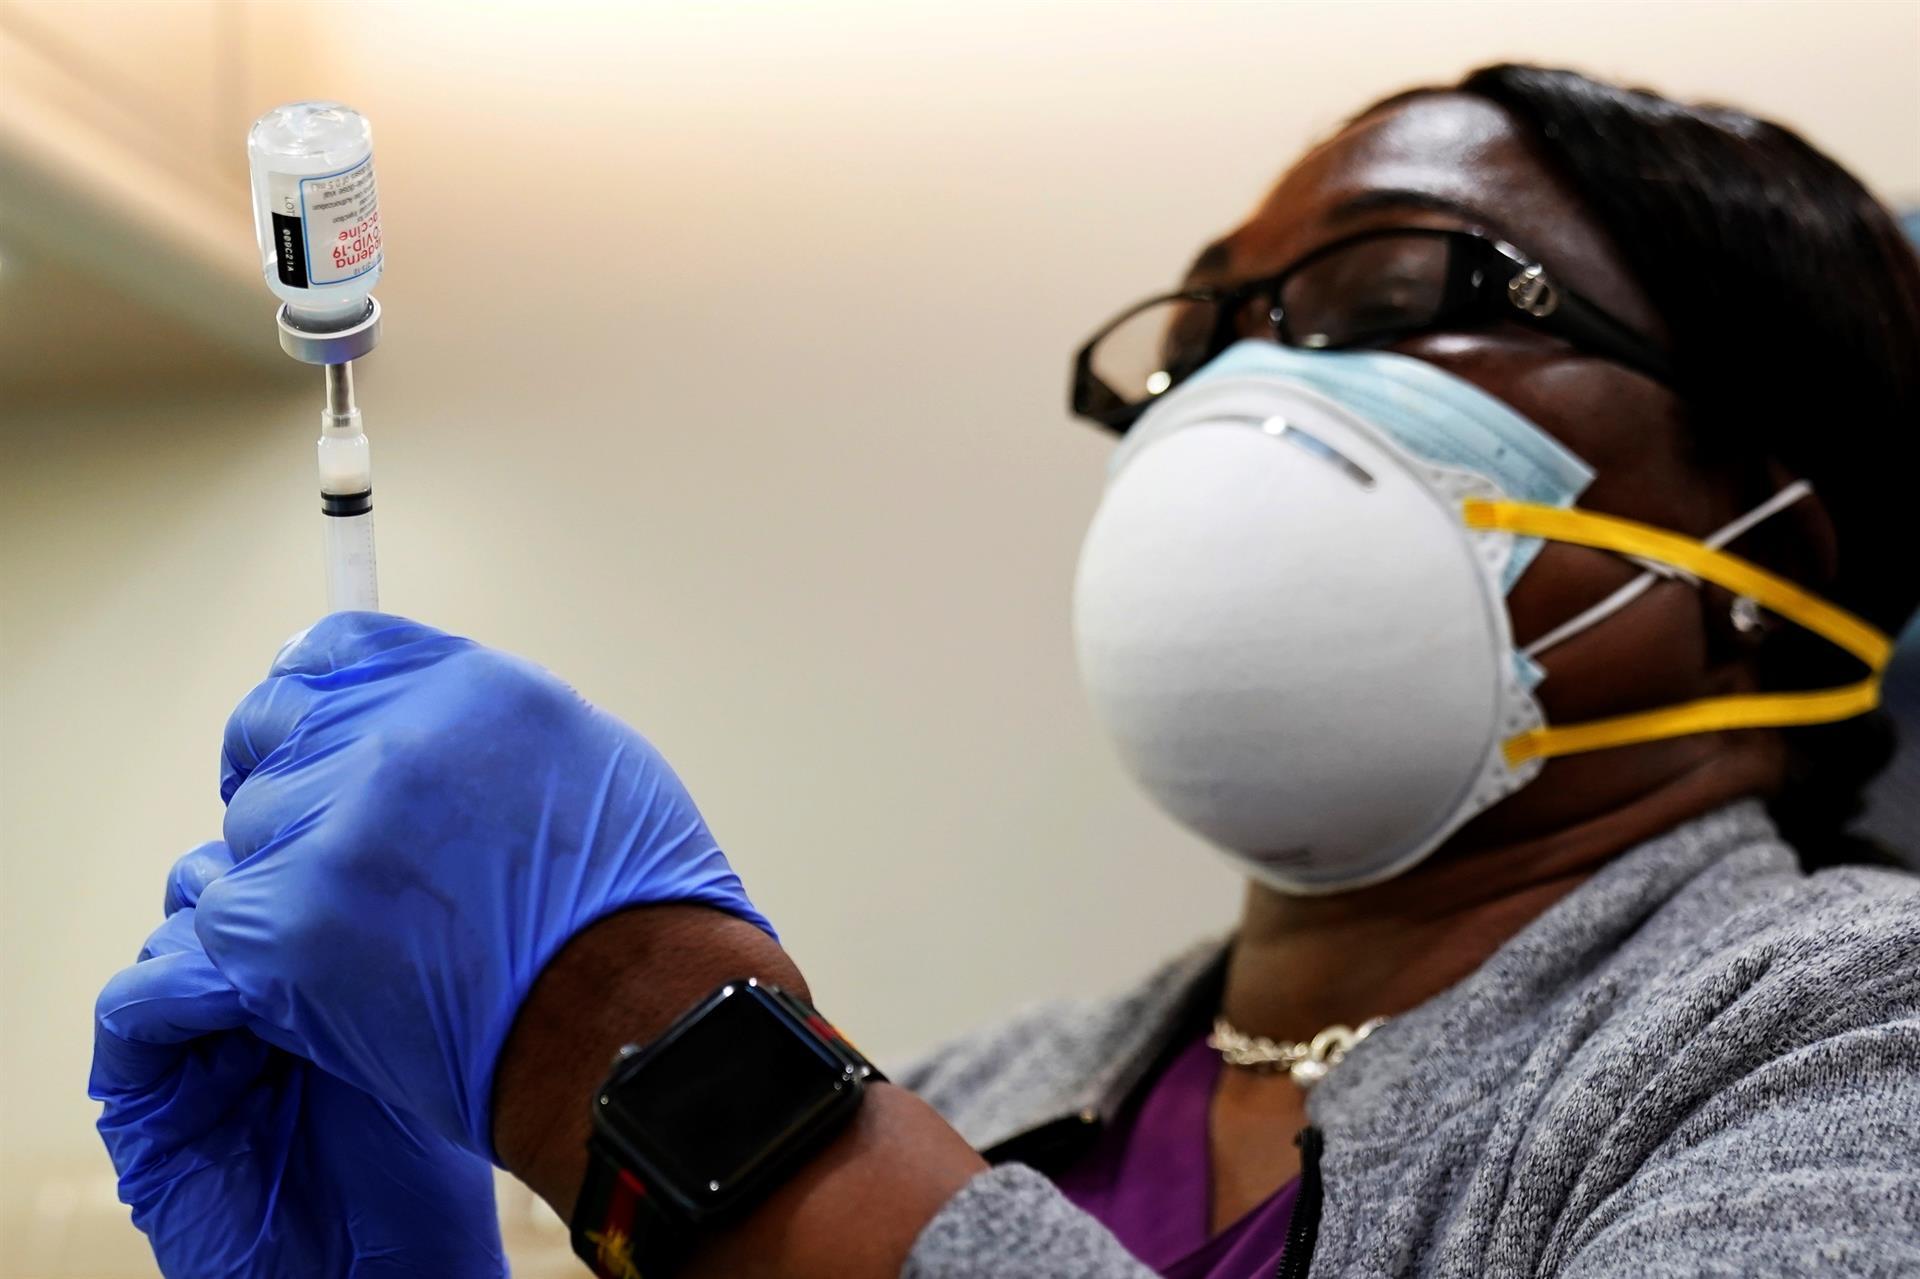 Profissional de saúde coloca insumo dentro de vacina